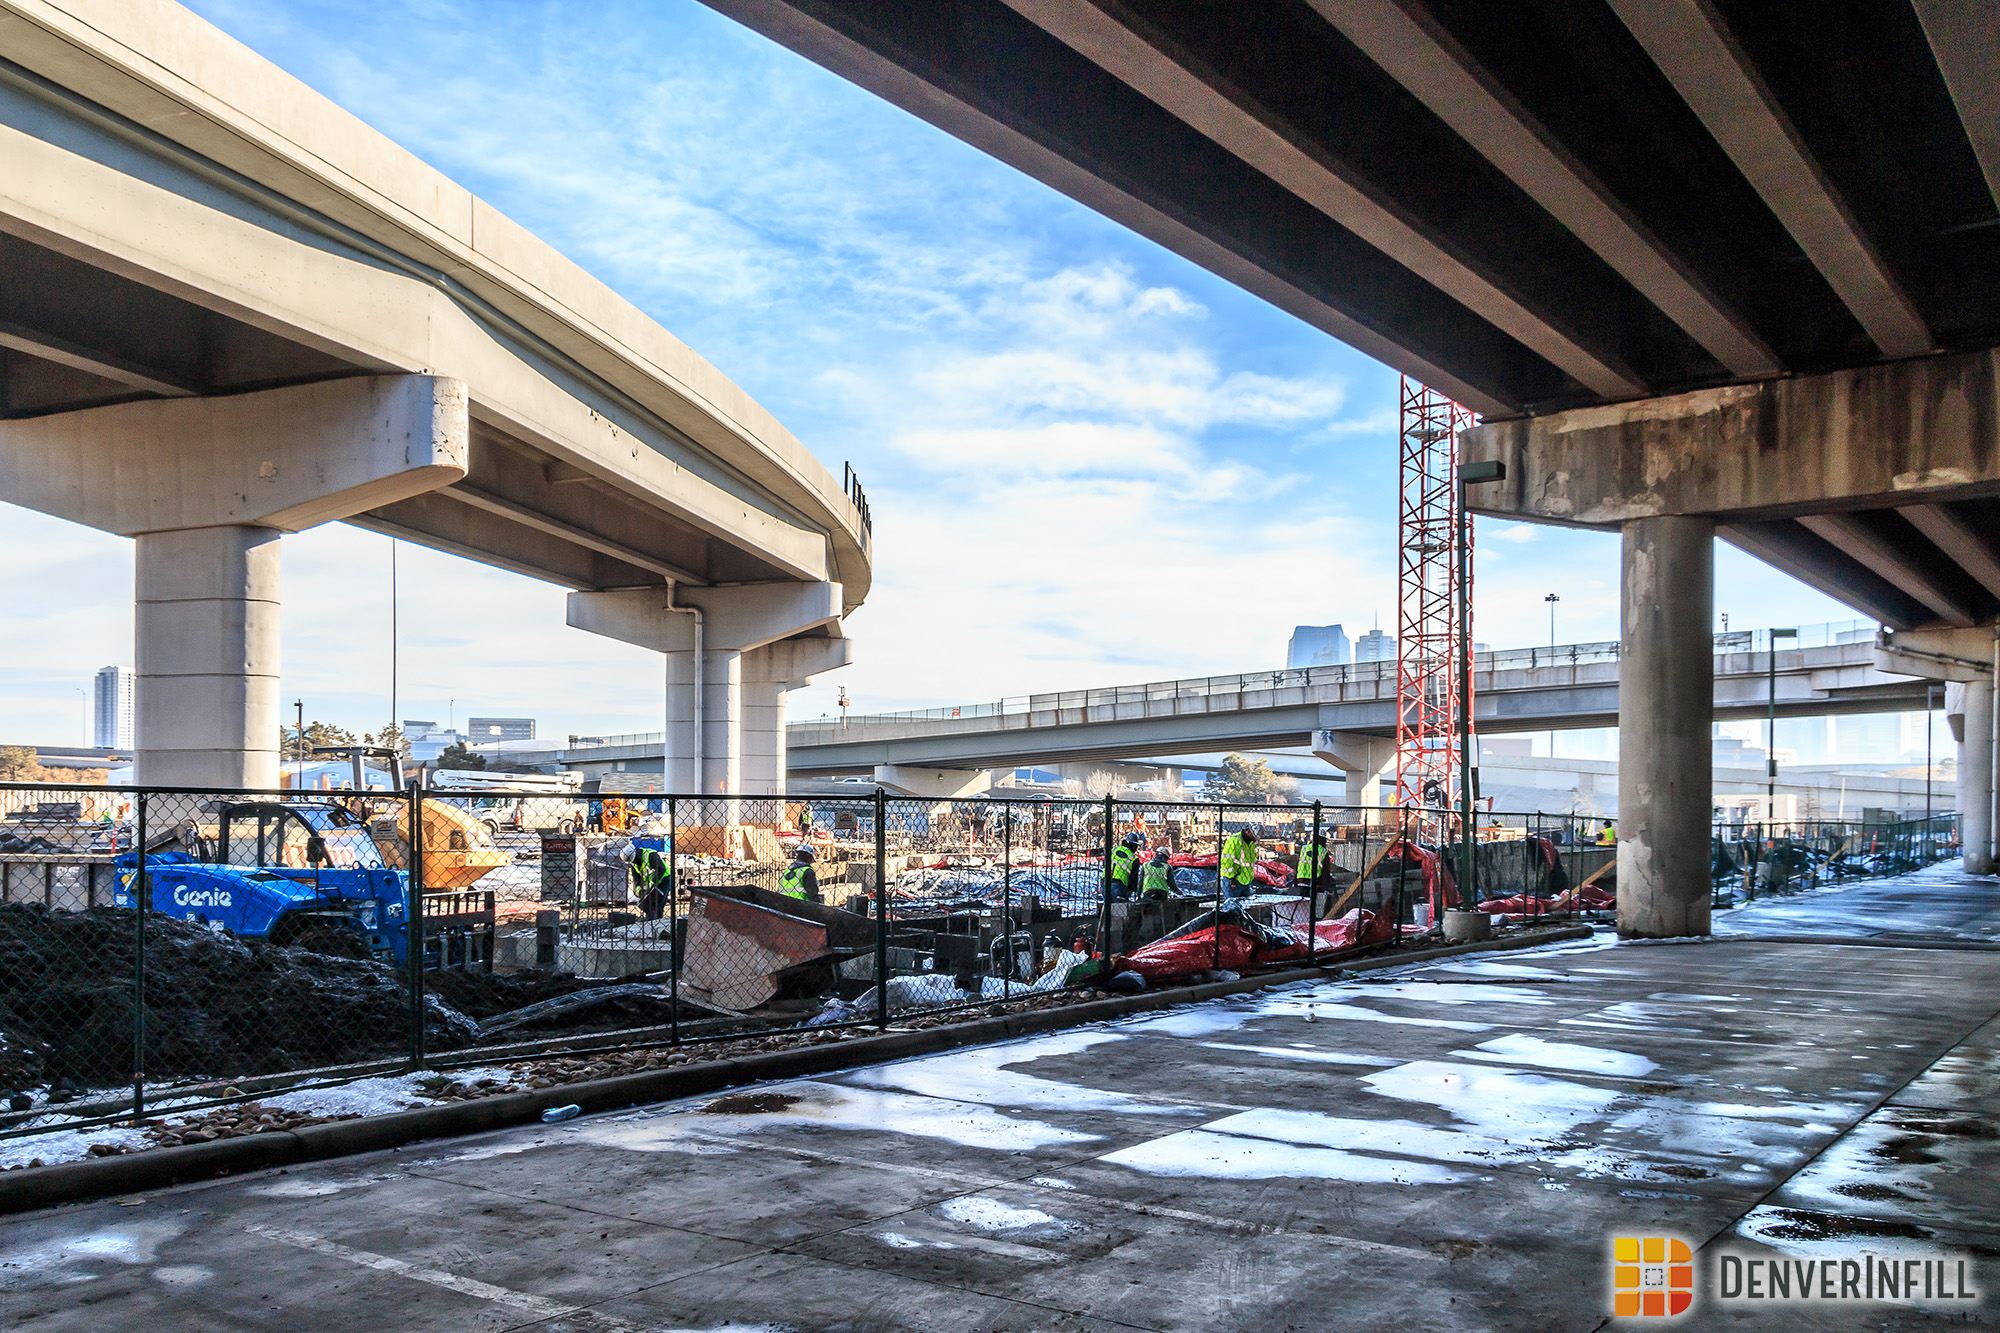 Meow Wolf Under Colfax Viaduct